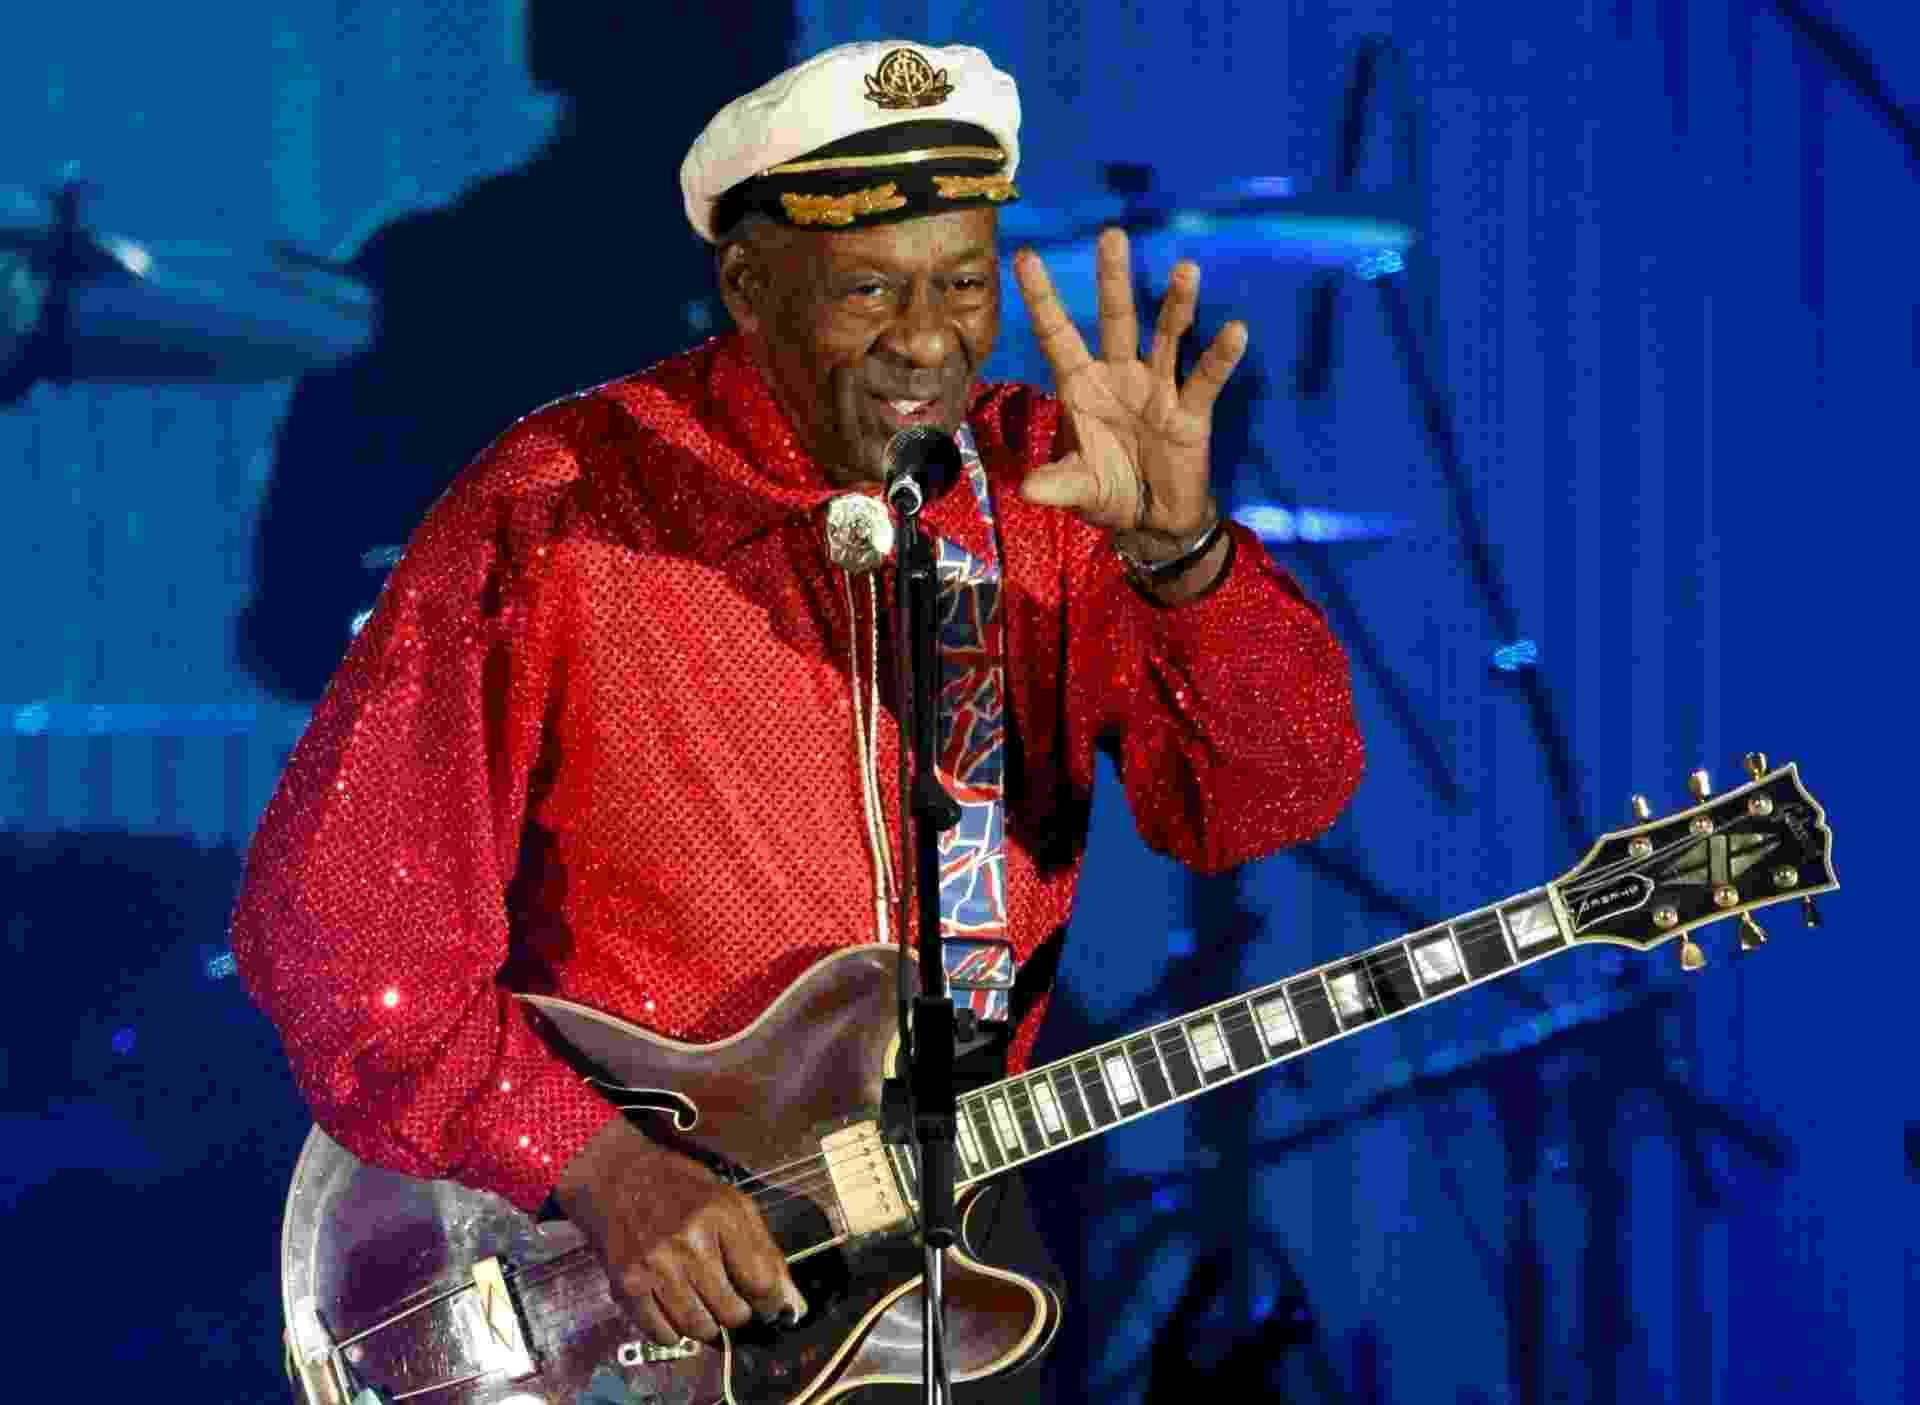 Lenda do rock, cantor, compositor e guitarrista Chuck Berry é achado morto aos 90 anos nos EUA - Reuters